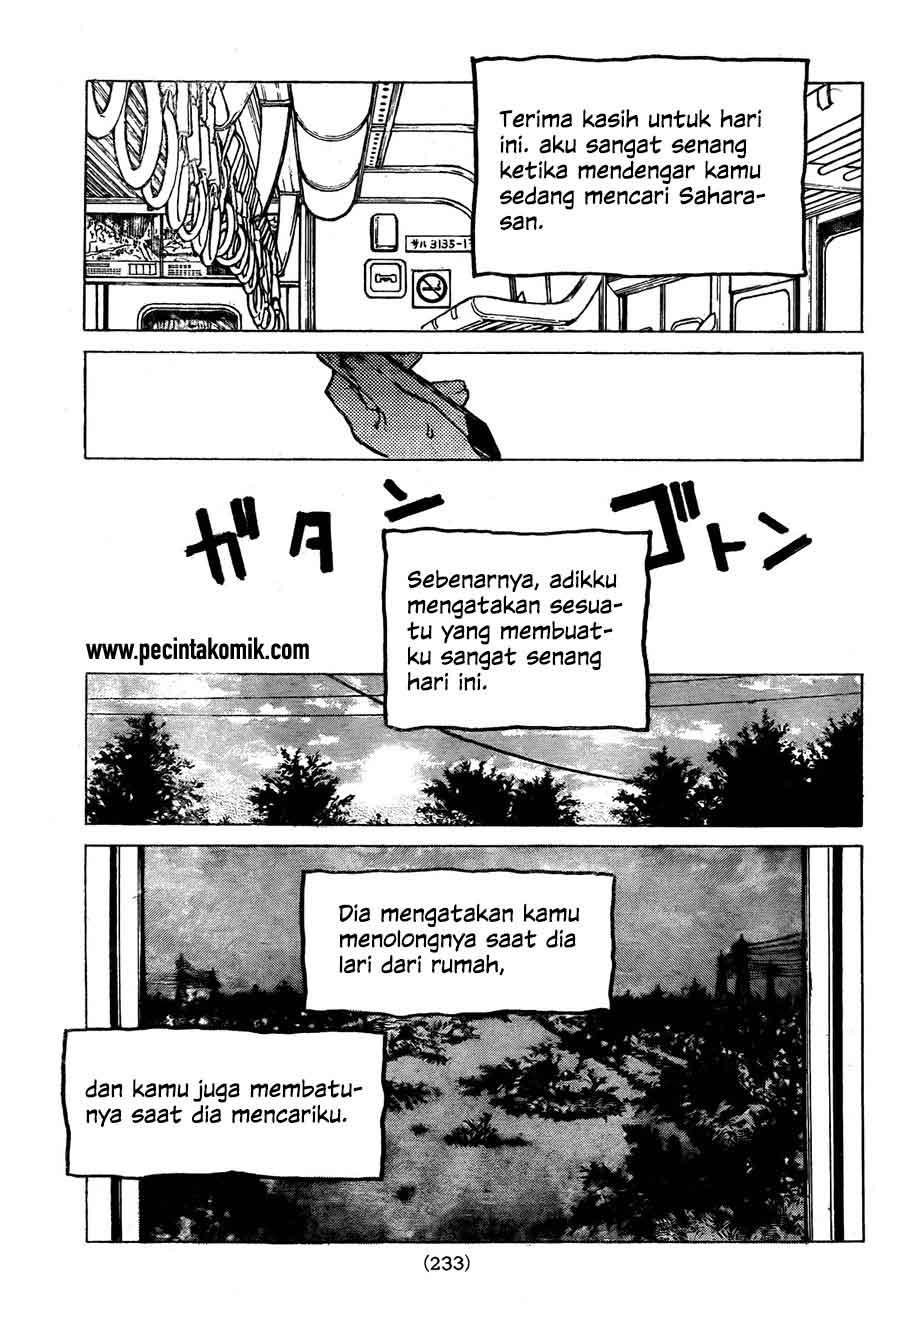 Koe no Katachi Chapter 15-20